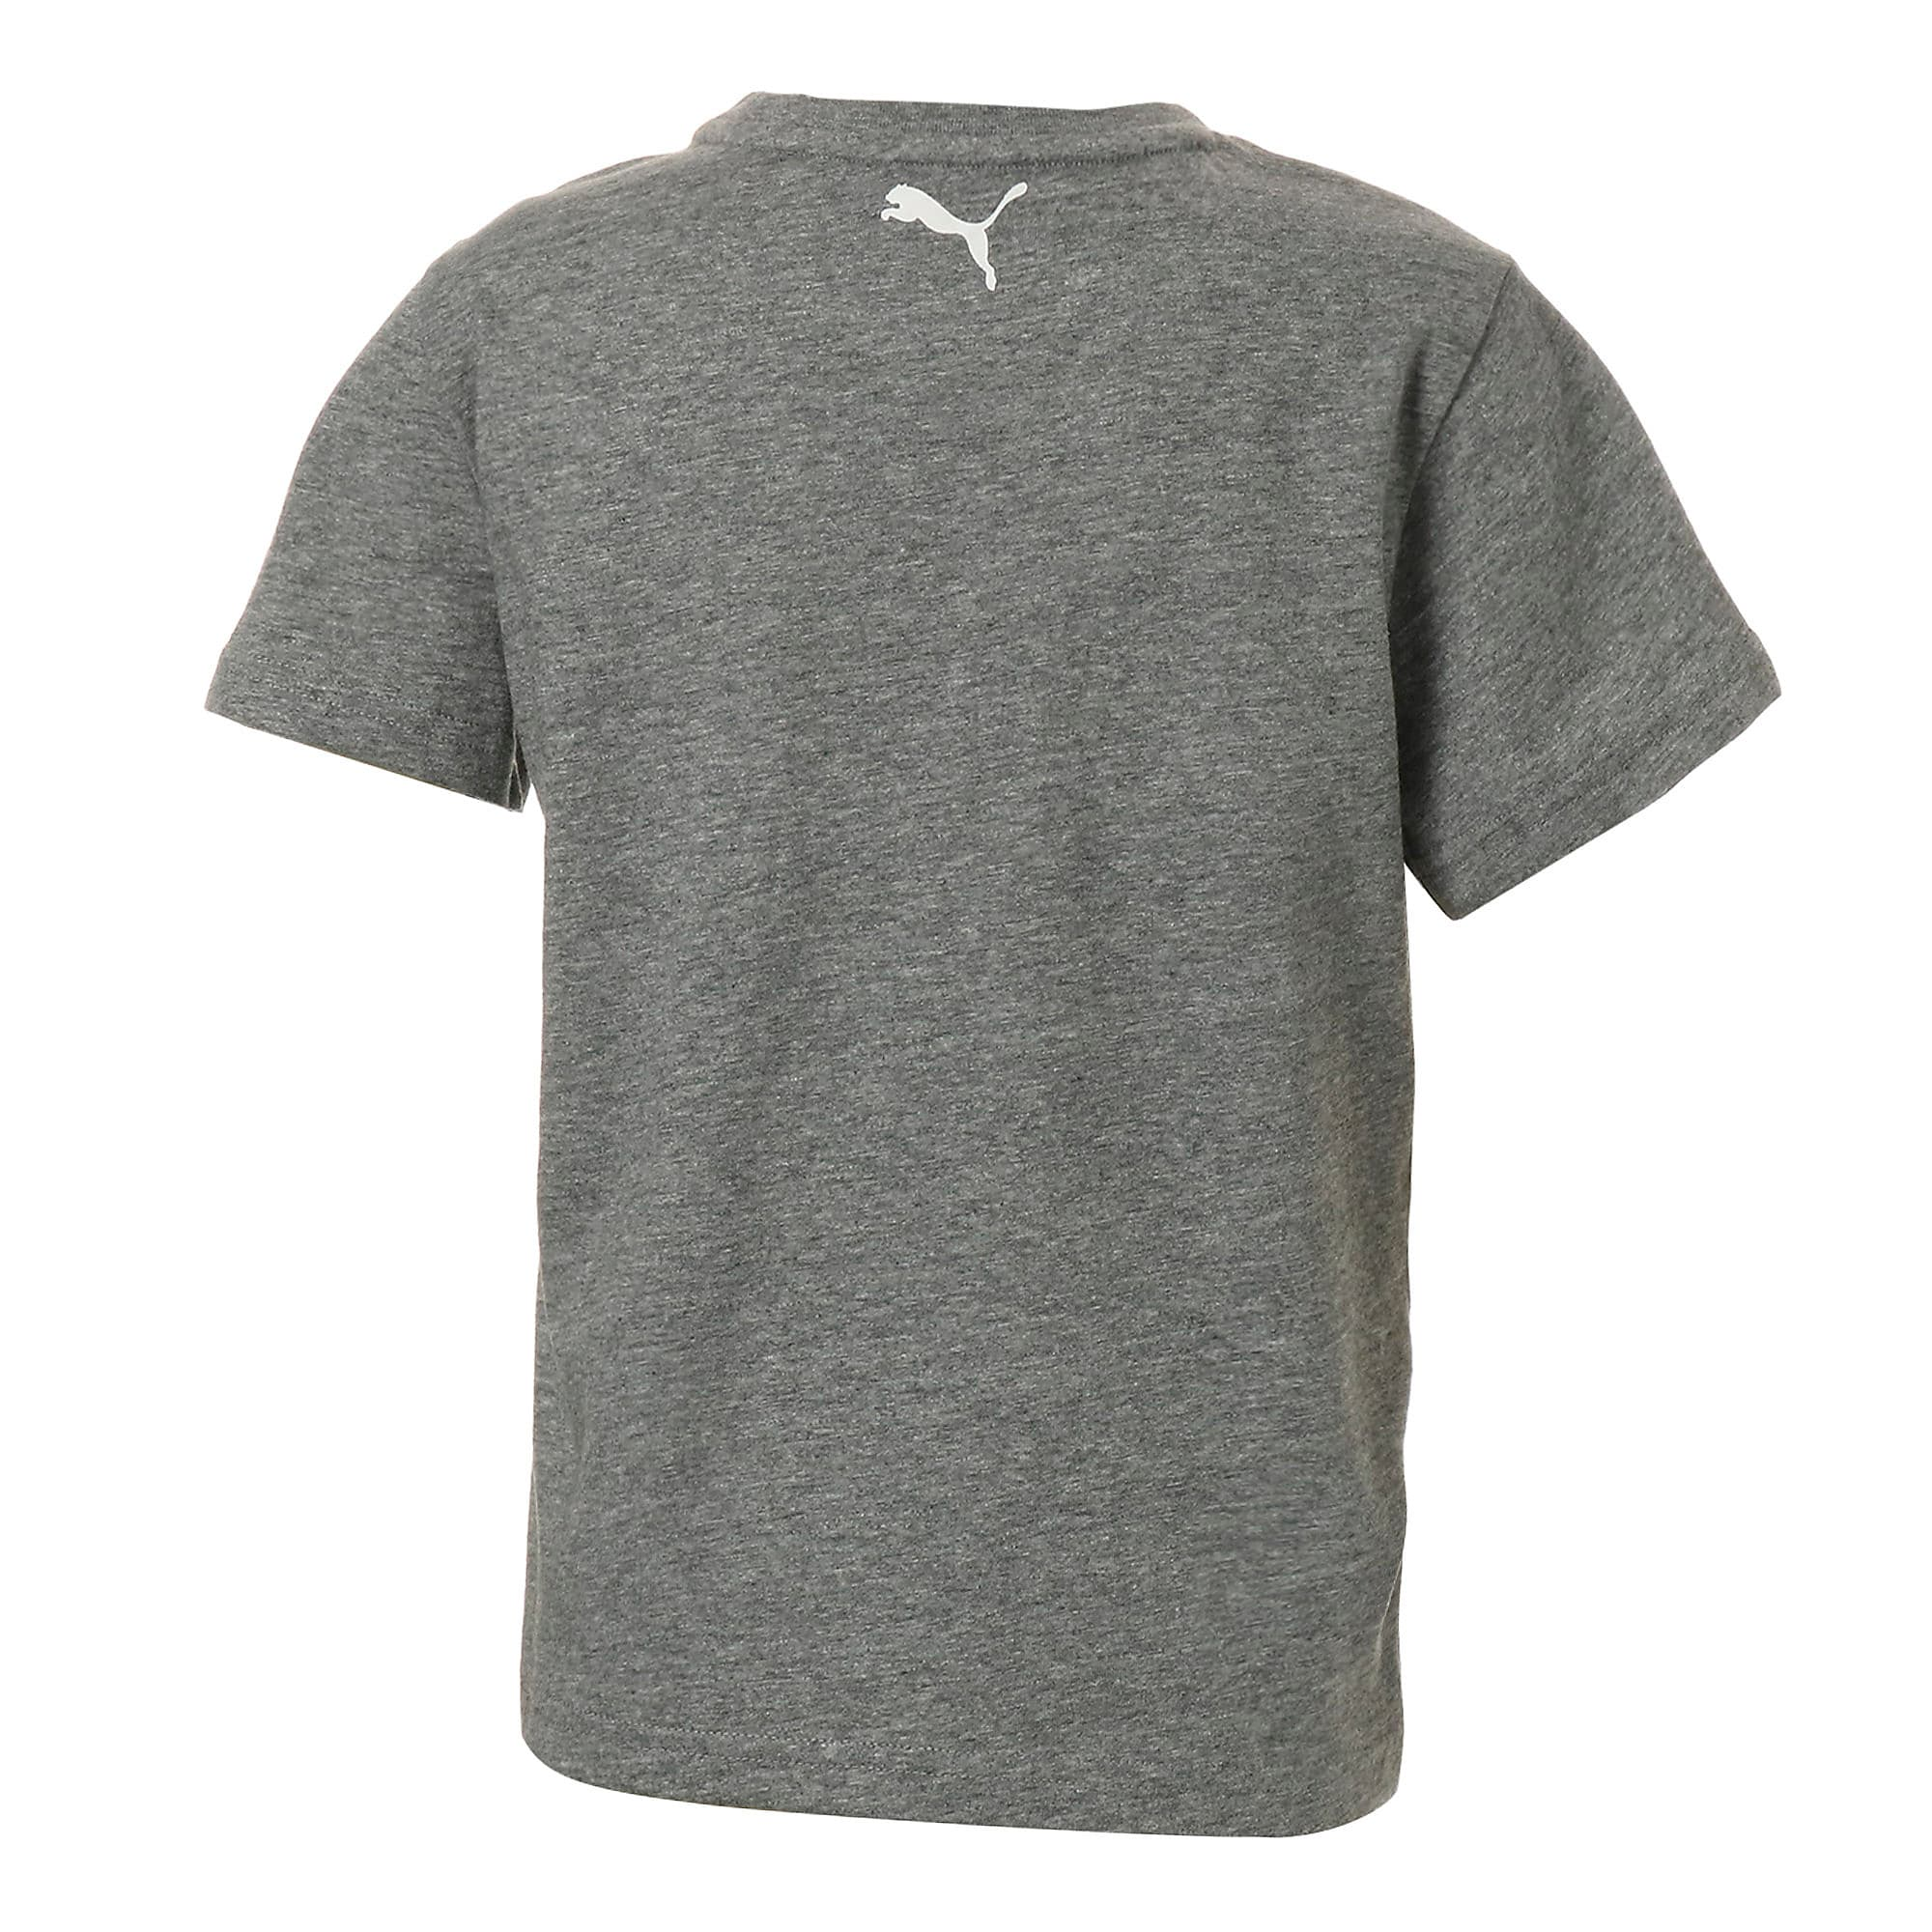 Thumbnail 3 of キッズ ALPHA SS グラフィック Tシャツ 半袖, Medium Gray Heather, medium-JPN